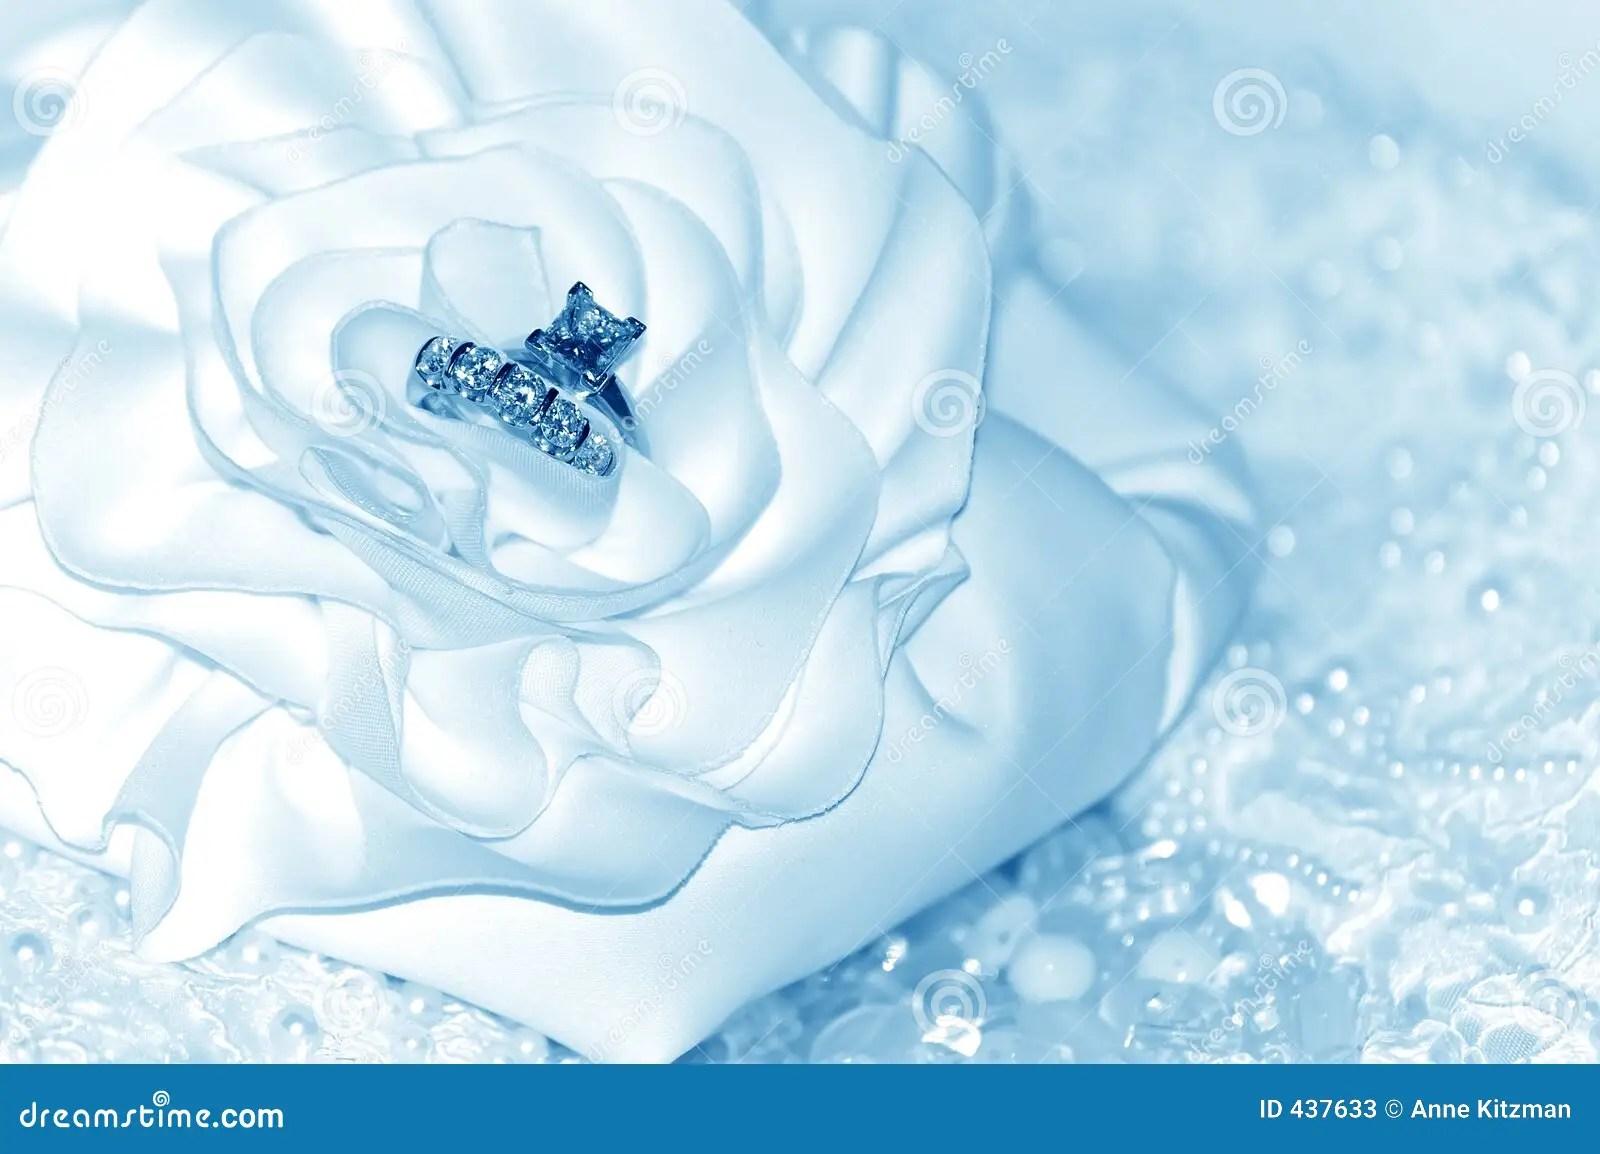 wedding rings with blue diamonds blue wedding rings wedding rings with blue diamonds image